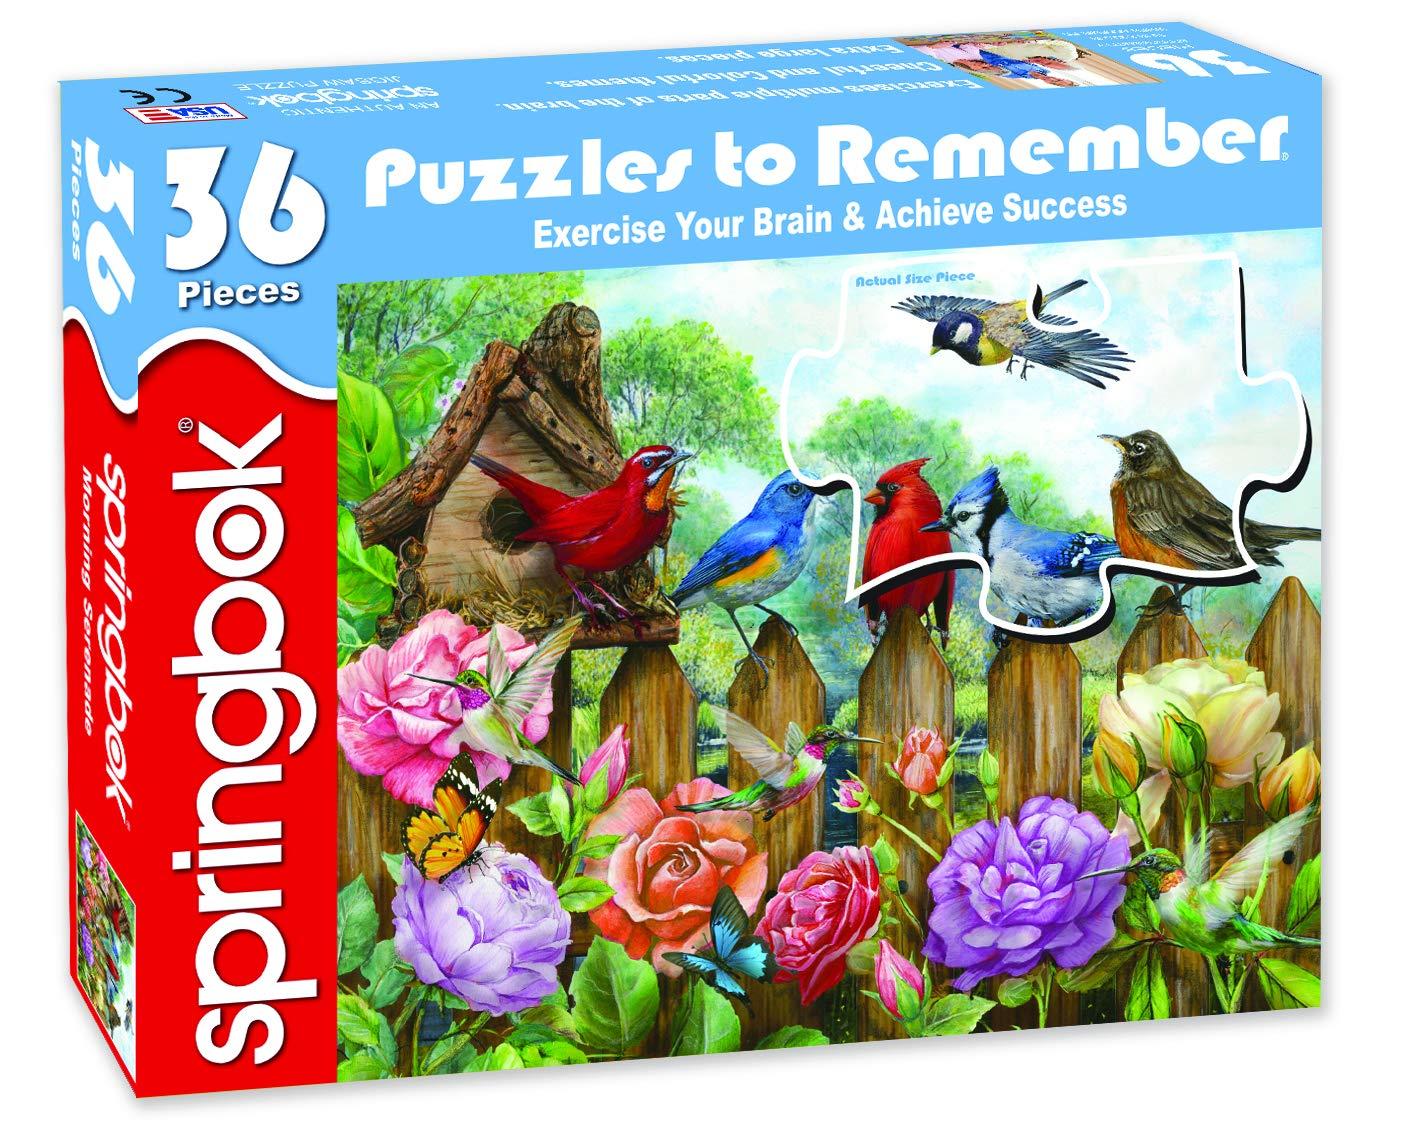 23.5 by 18 Puzzle Springbok Puzzles- Morning Serenade Alzheimer /& Dementia Puzzle 36 Piece Made in USA Unique Cut Interlocking Pieces